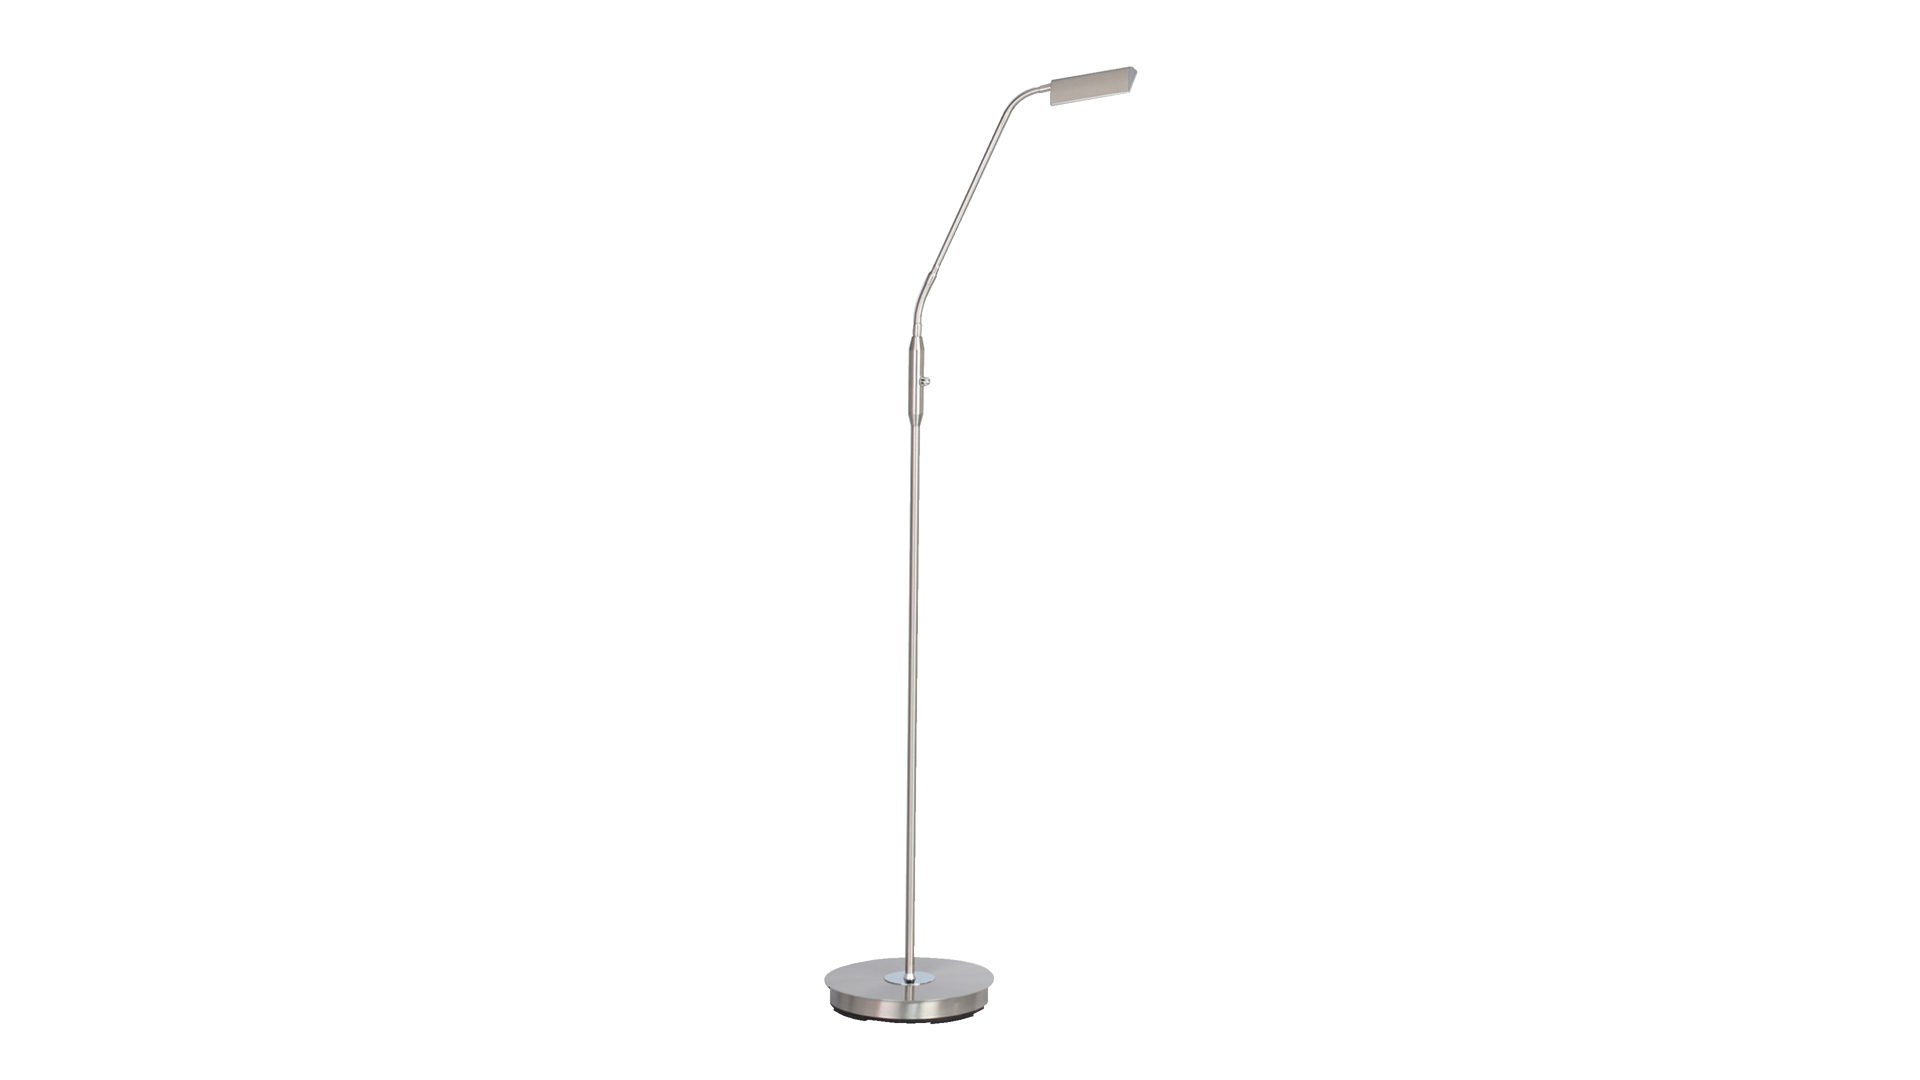 LED Standleuchte Cory, Nickel matt & Chrom – Höhe ca. 150 cm, Bad ...